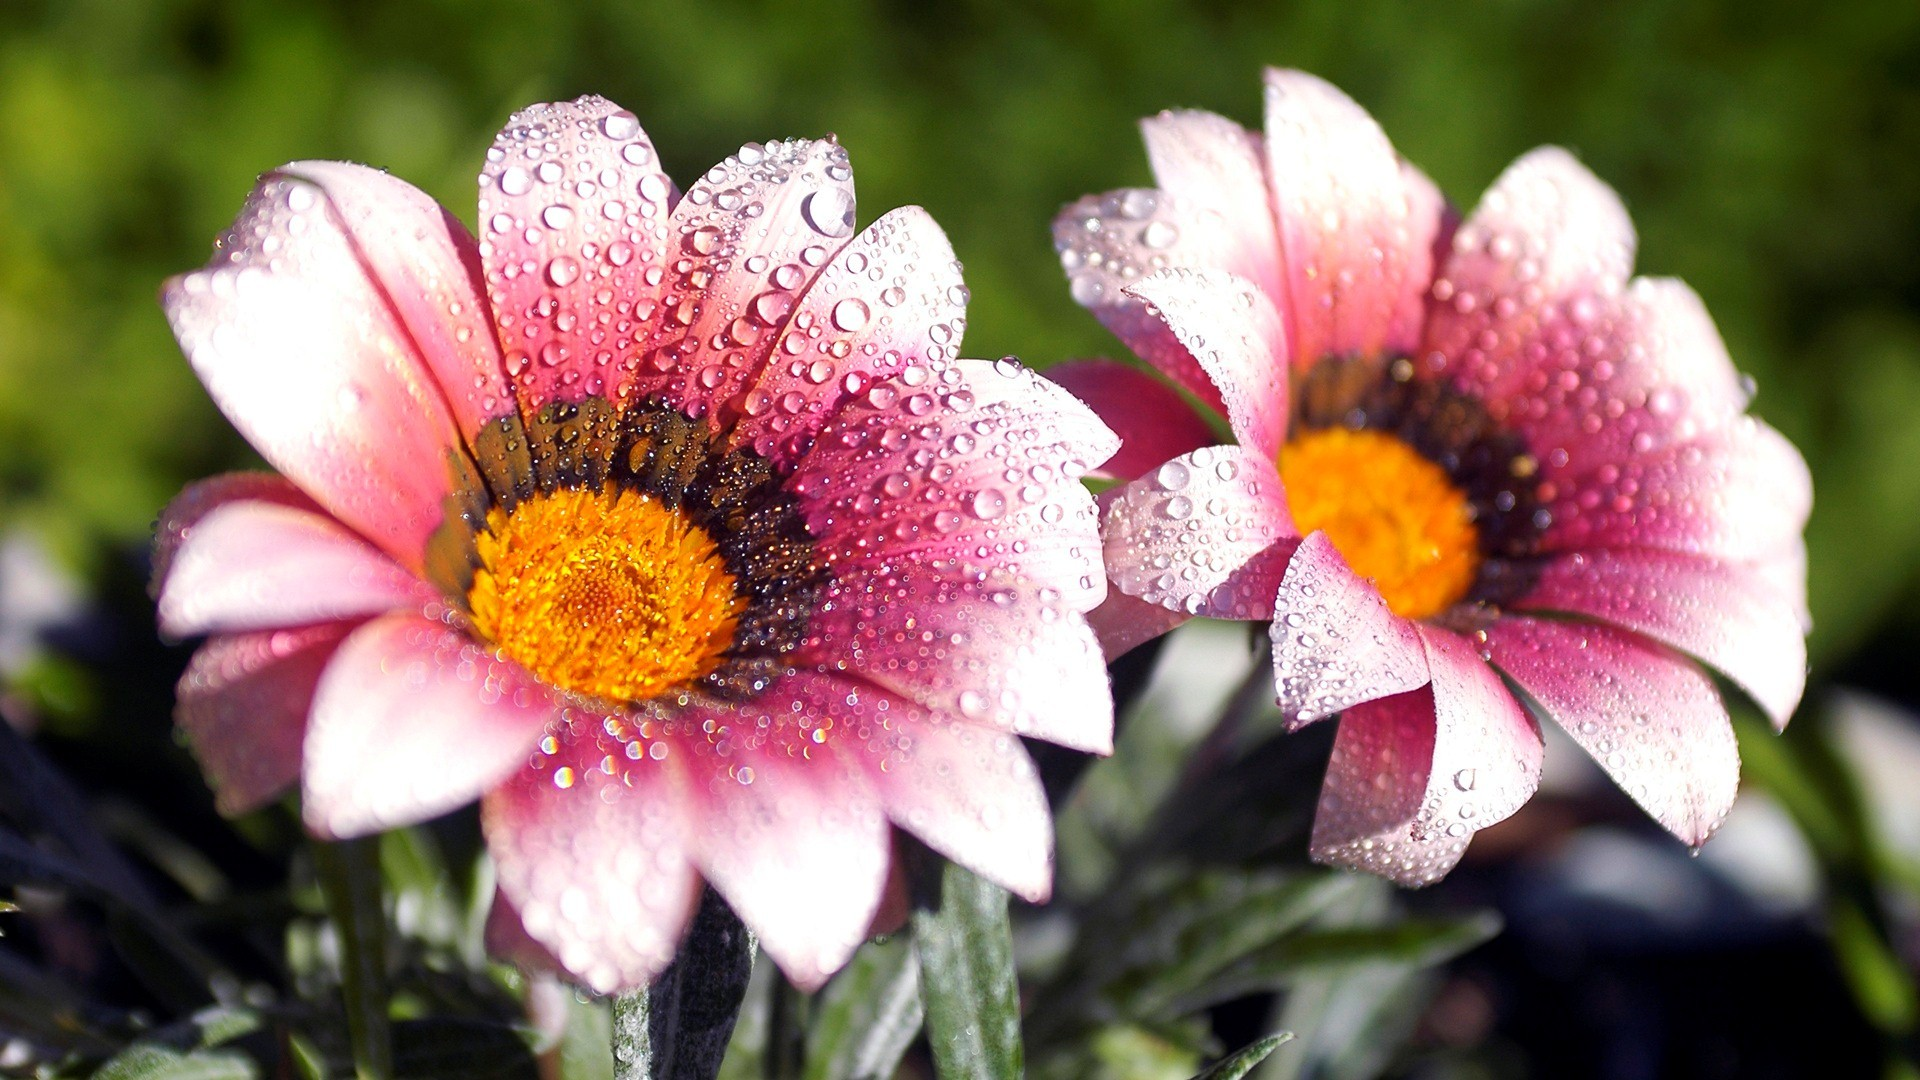 Beautiful Amazing Flower Water Drops HD Wallpaper Background